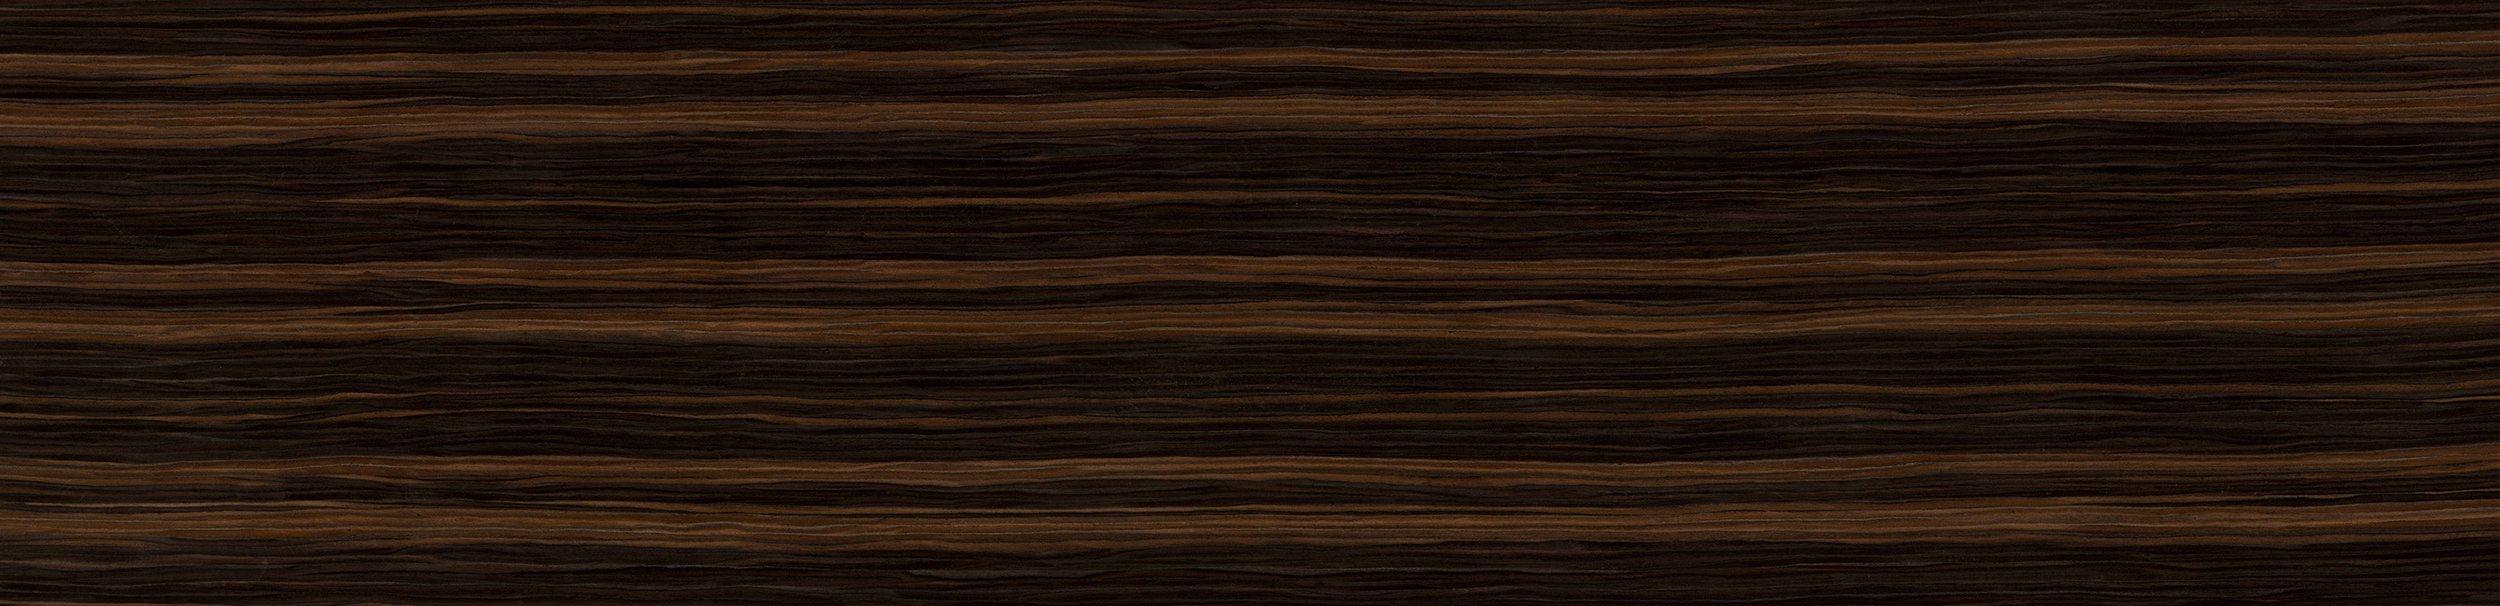 Item+Ebony+10.44+%28250x120cm%29+two+sheets.jpg